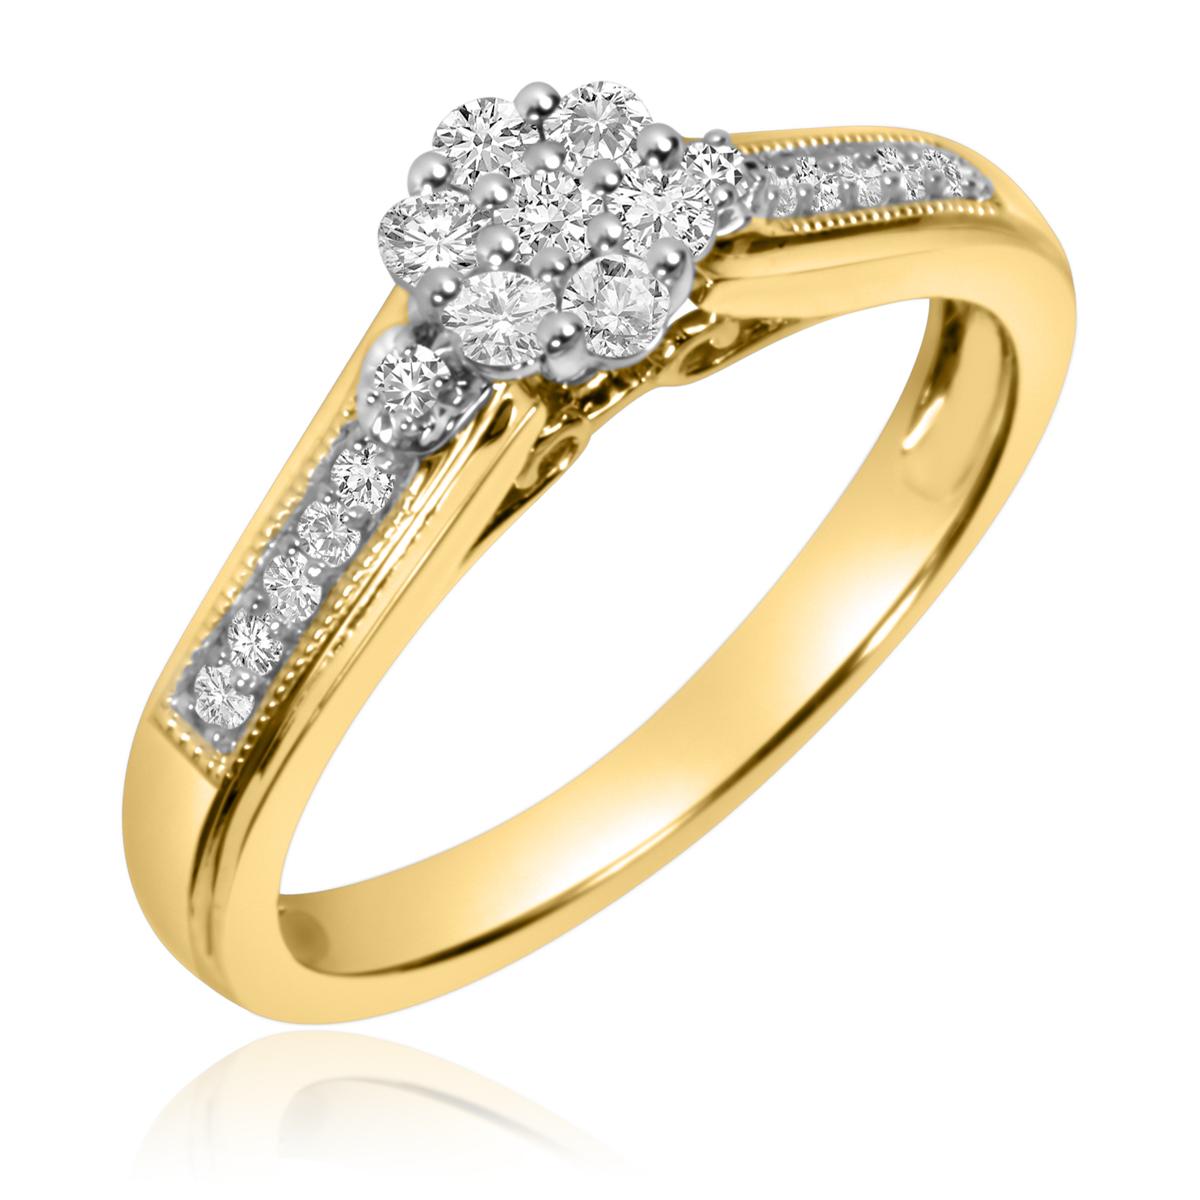 1/4 CT. T.W. Round Cut Diamond Ladies Engagement Ring 10K Yellow Gold- Size 8